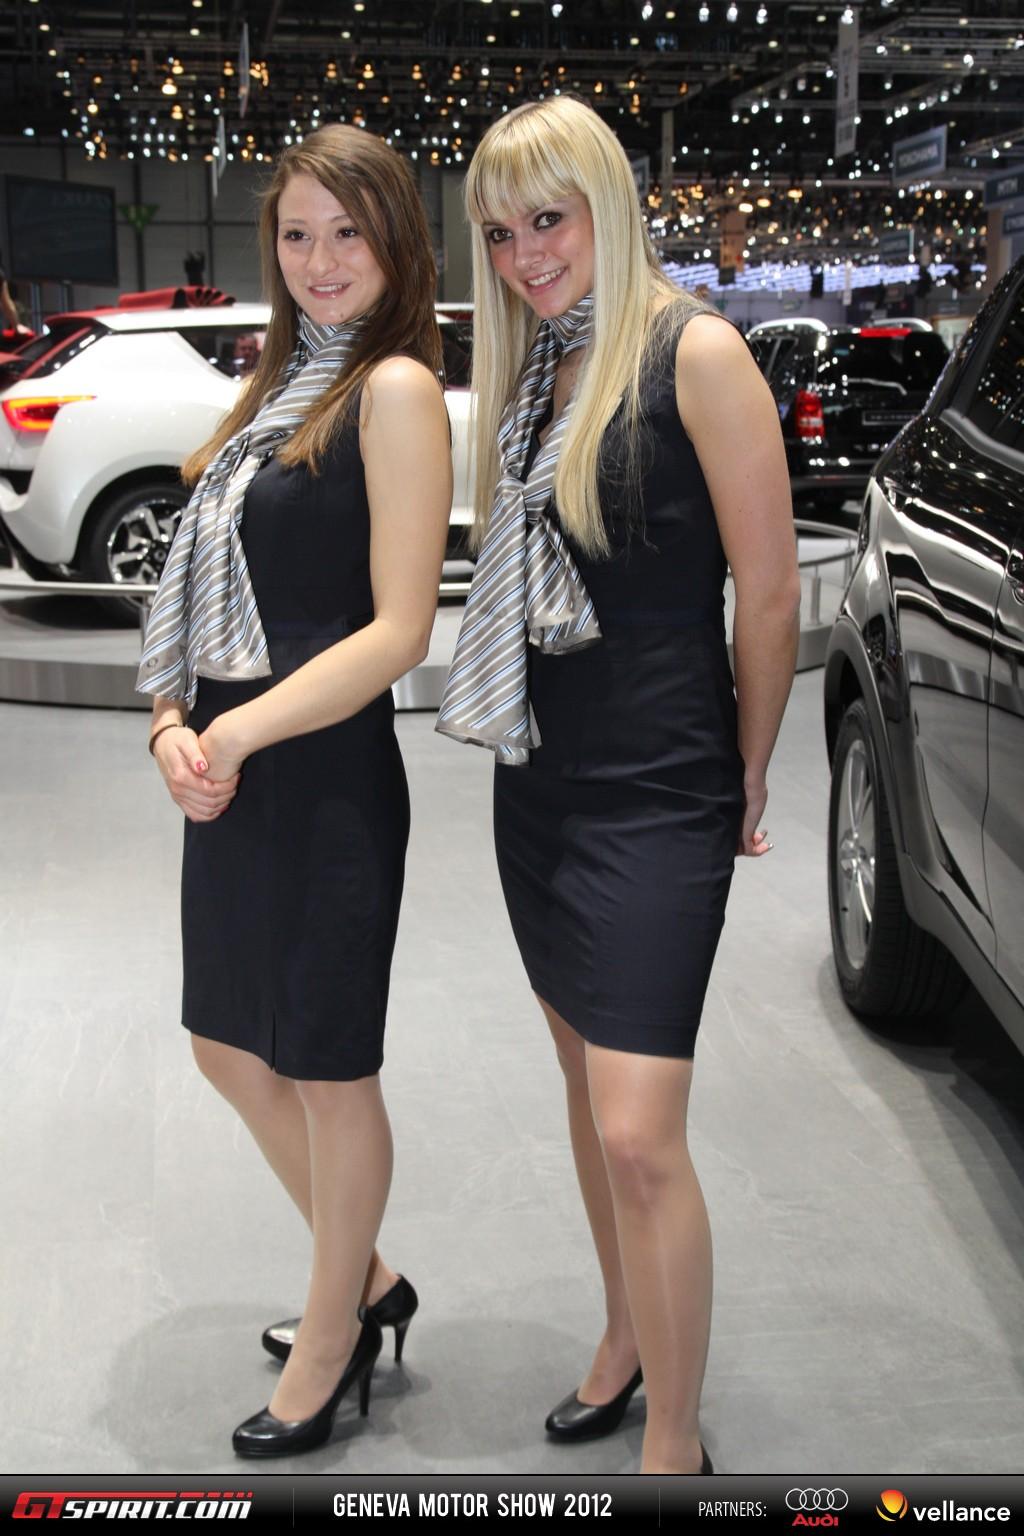 Geneva Motor Show 2012 Girls Part 2 013